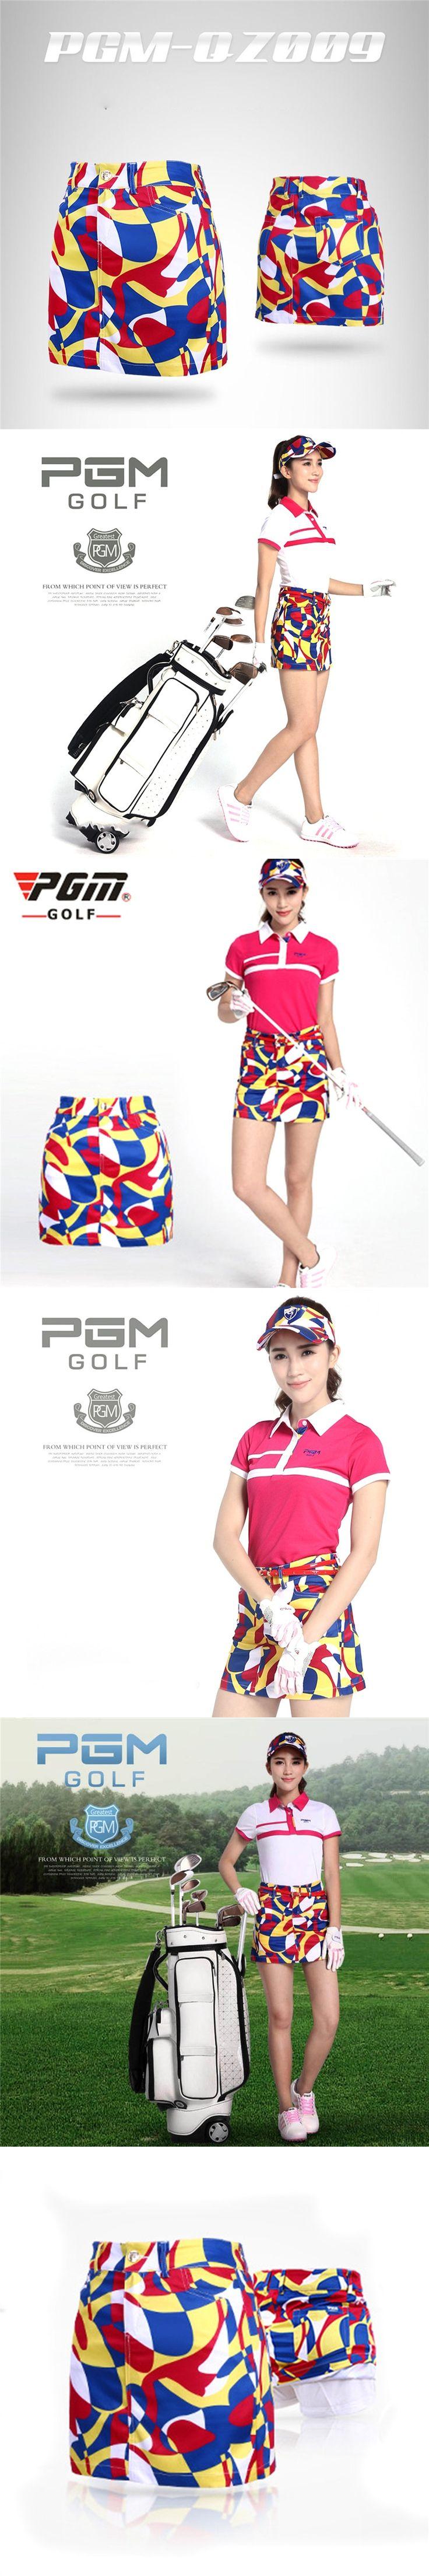 PGM Brand Polo Golf Skirt Women Short Printing Dresses Golf Clothes Ladies Leisure Elastic Sport Anti-Wrinkle Skirts Size XS-XL